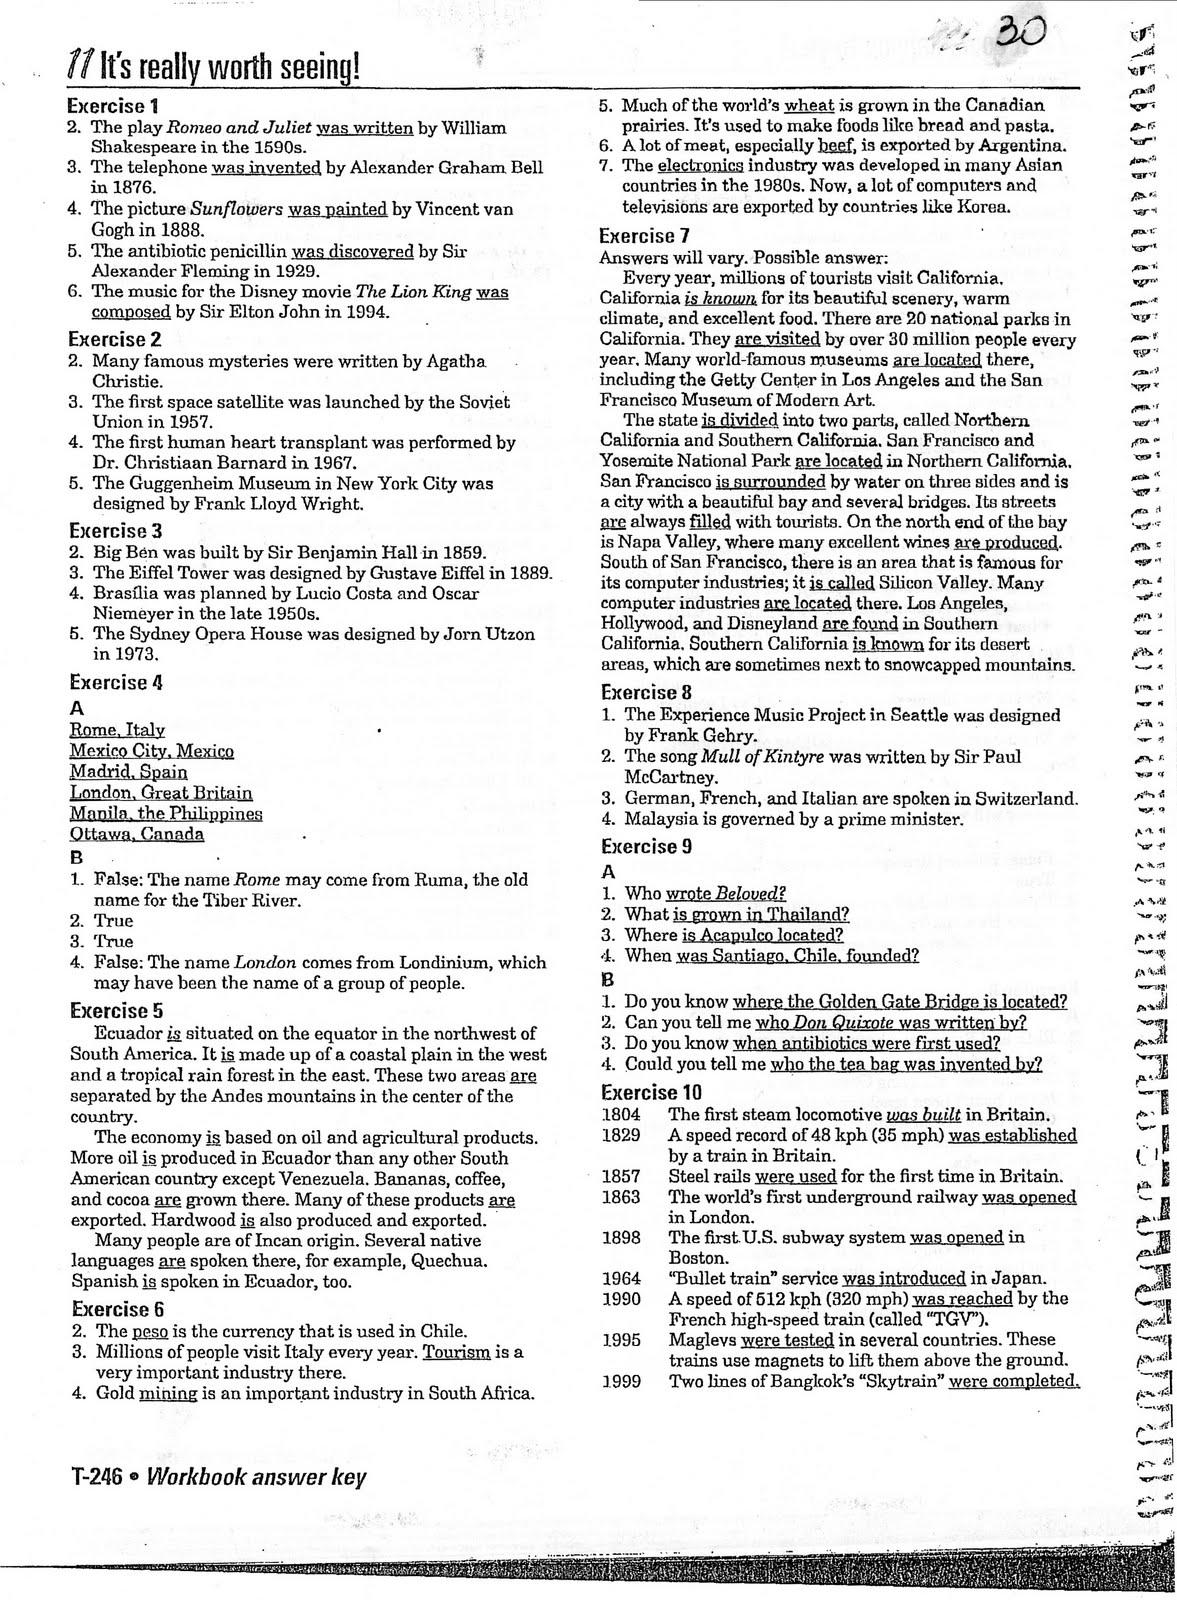 Workbooks spanish 3 workbook answers : Interchange 2 (English Textbook): septiembre 2010